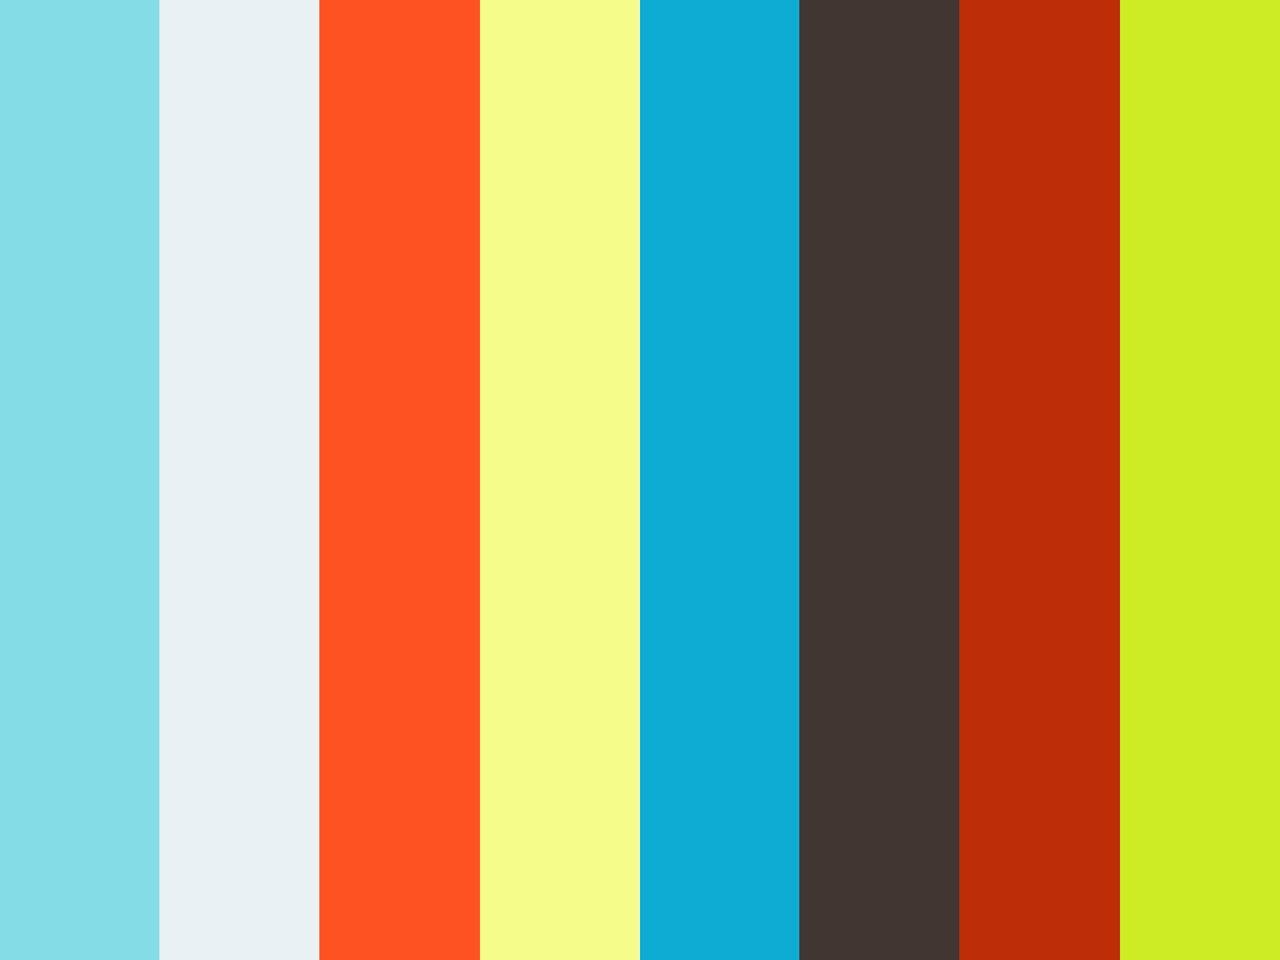 18097_box_modulation_16_10